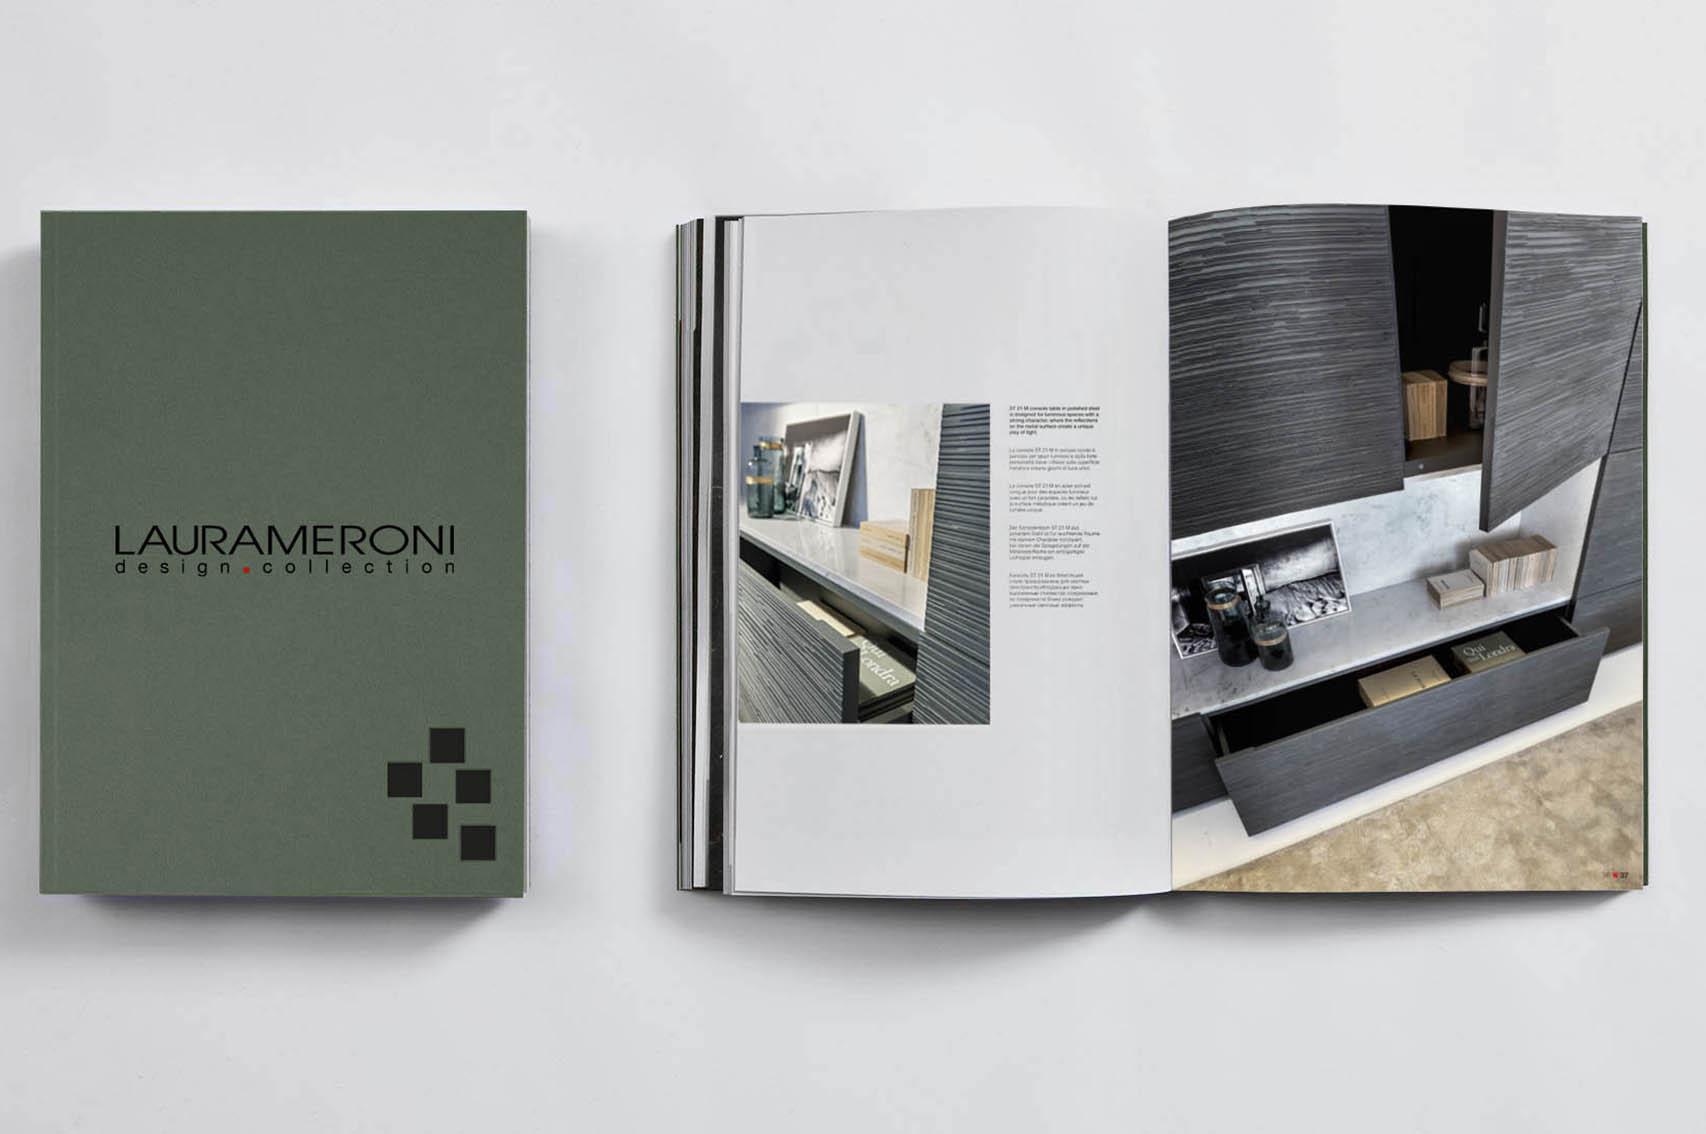 Laurameroni modular customizable day systems catalogue free download